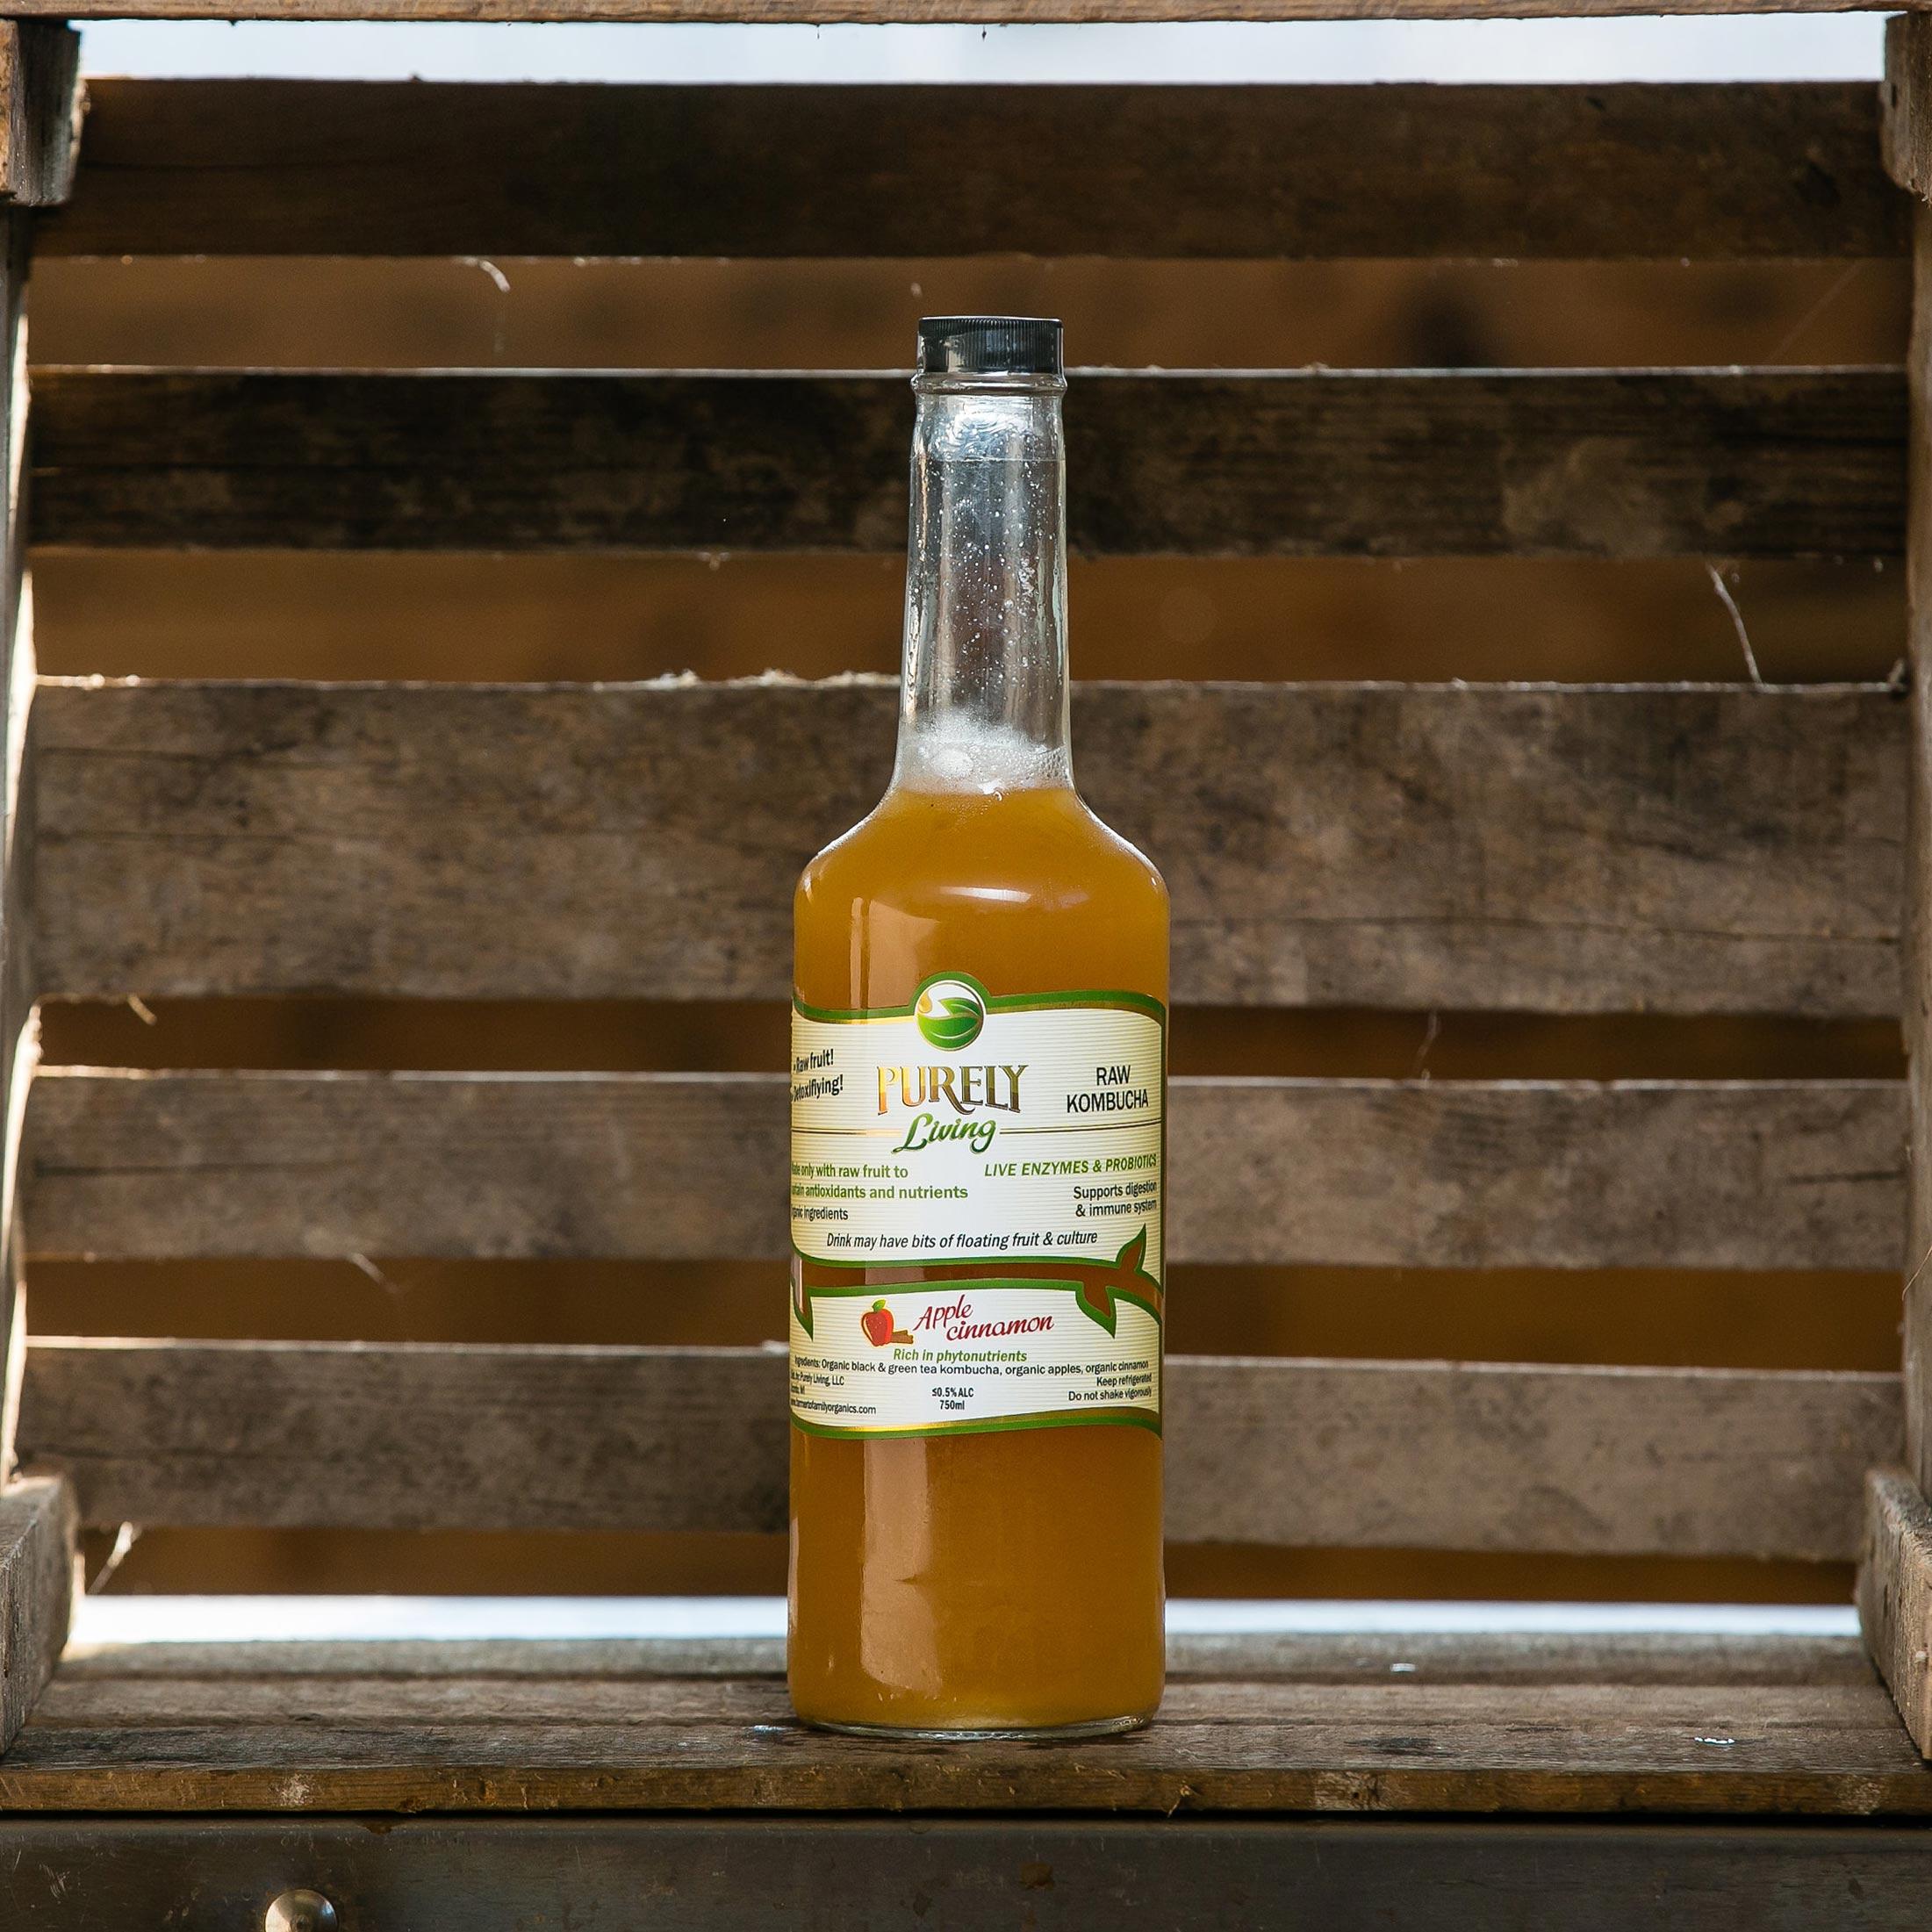 Apple Cinnamon - Ingredients: Organic Black and Green Tea Kombucha, Organic Raw Apples, Organic Cinnamon